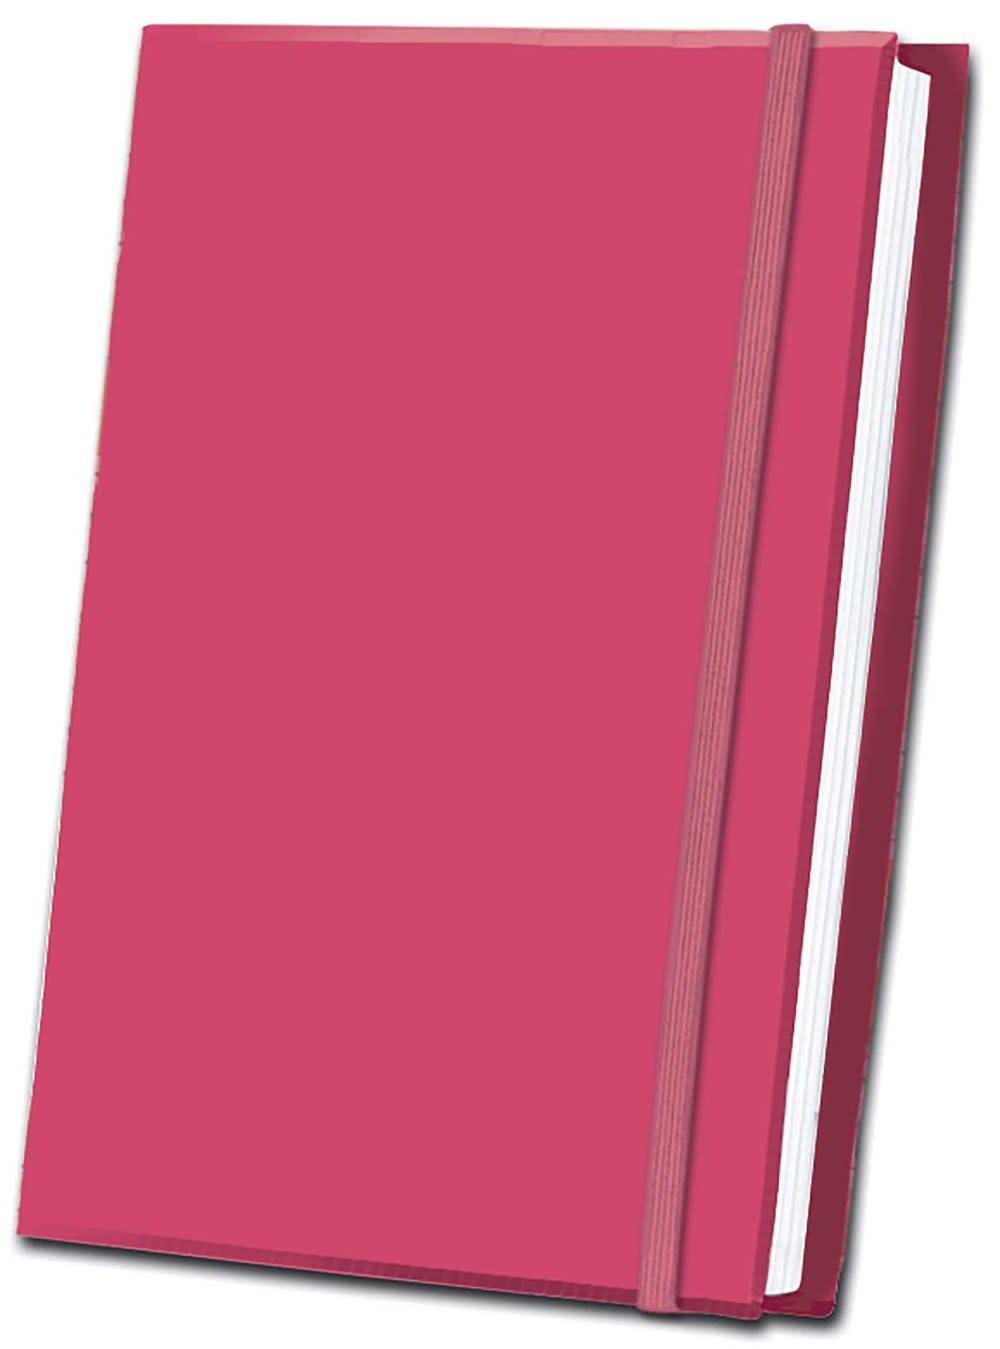 Thunder Bay Press Pink Fabric Journal